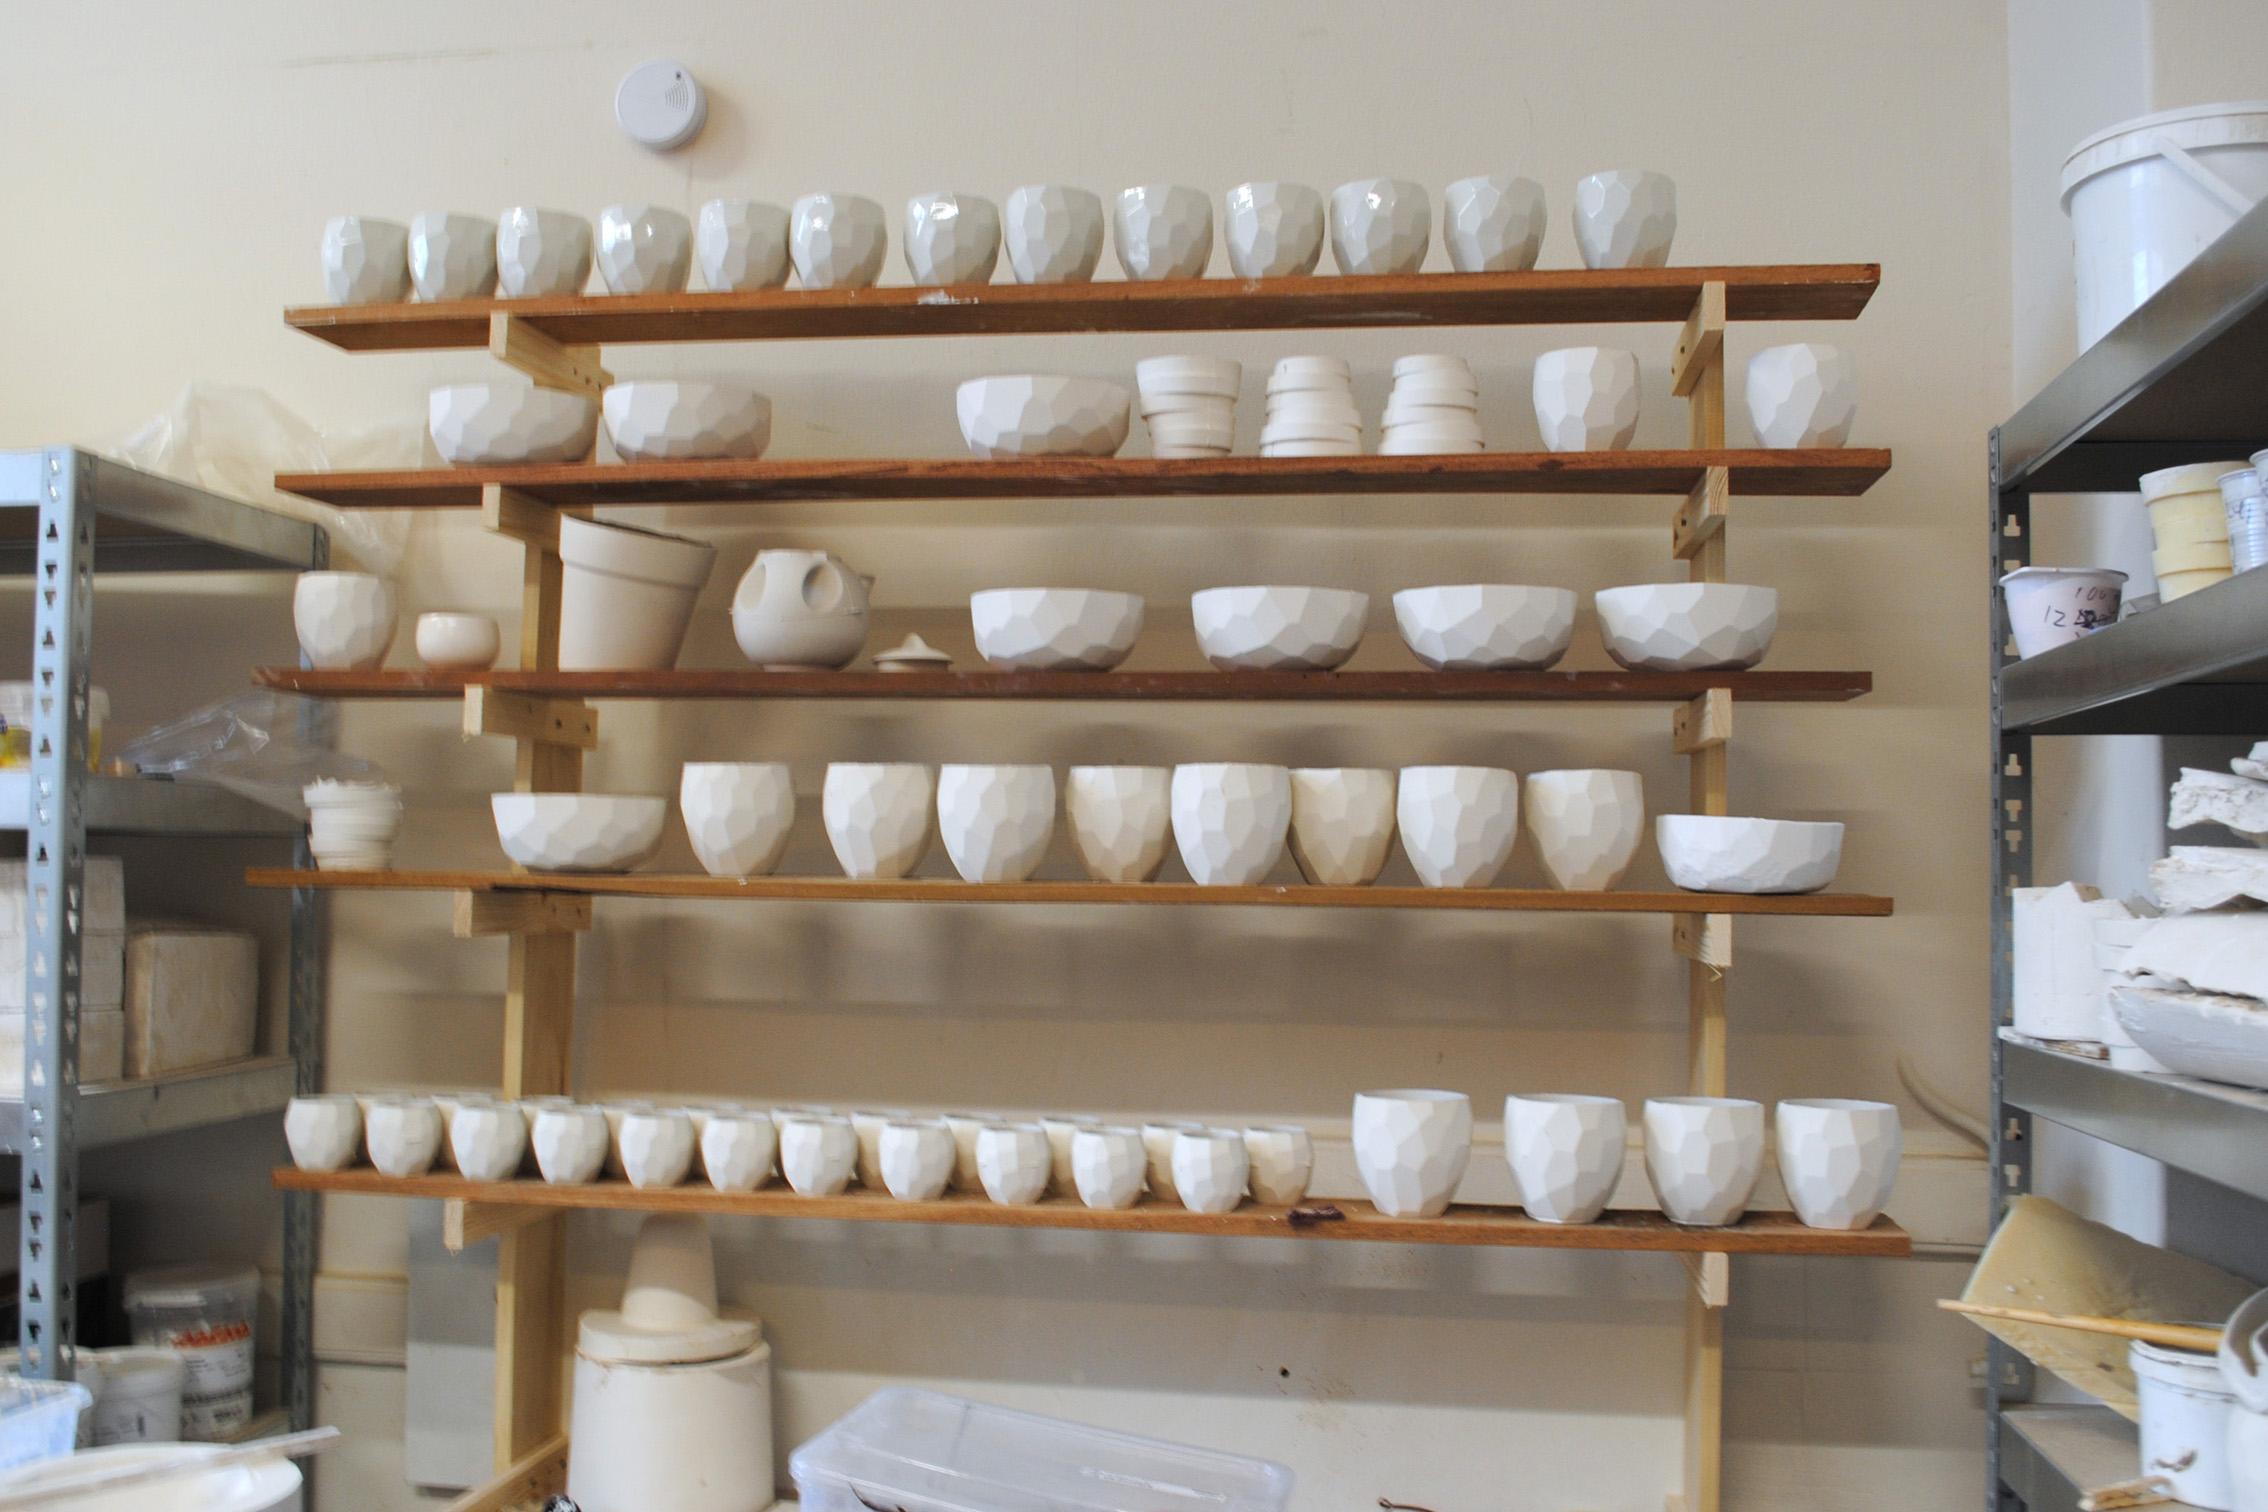 a12_mdba_mdby_manufactured_ceramics_design_studio_lorier_ production